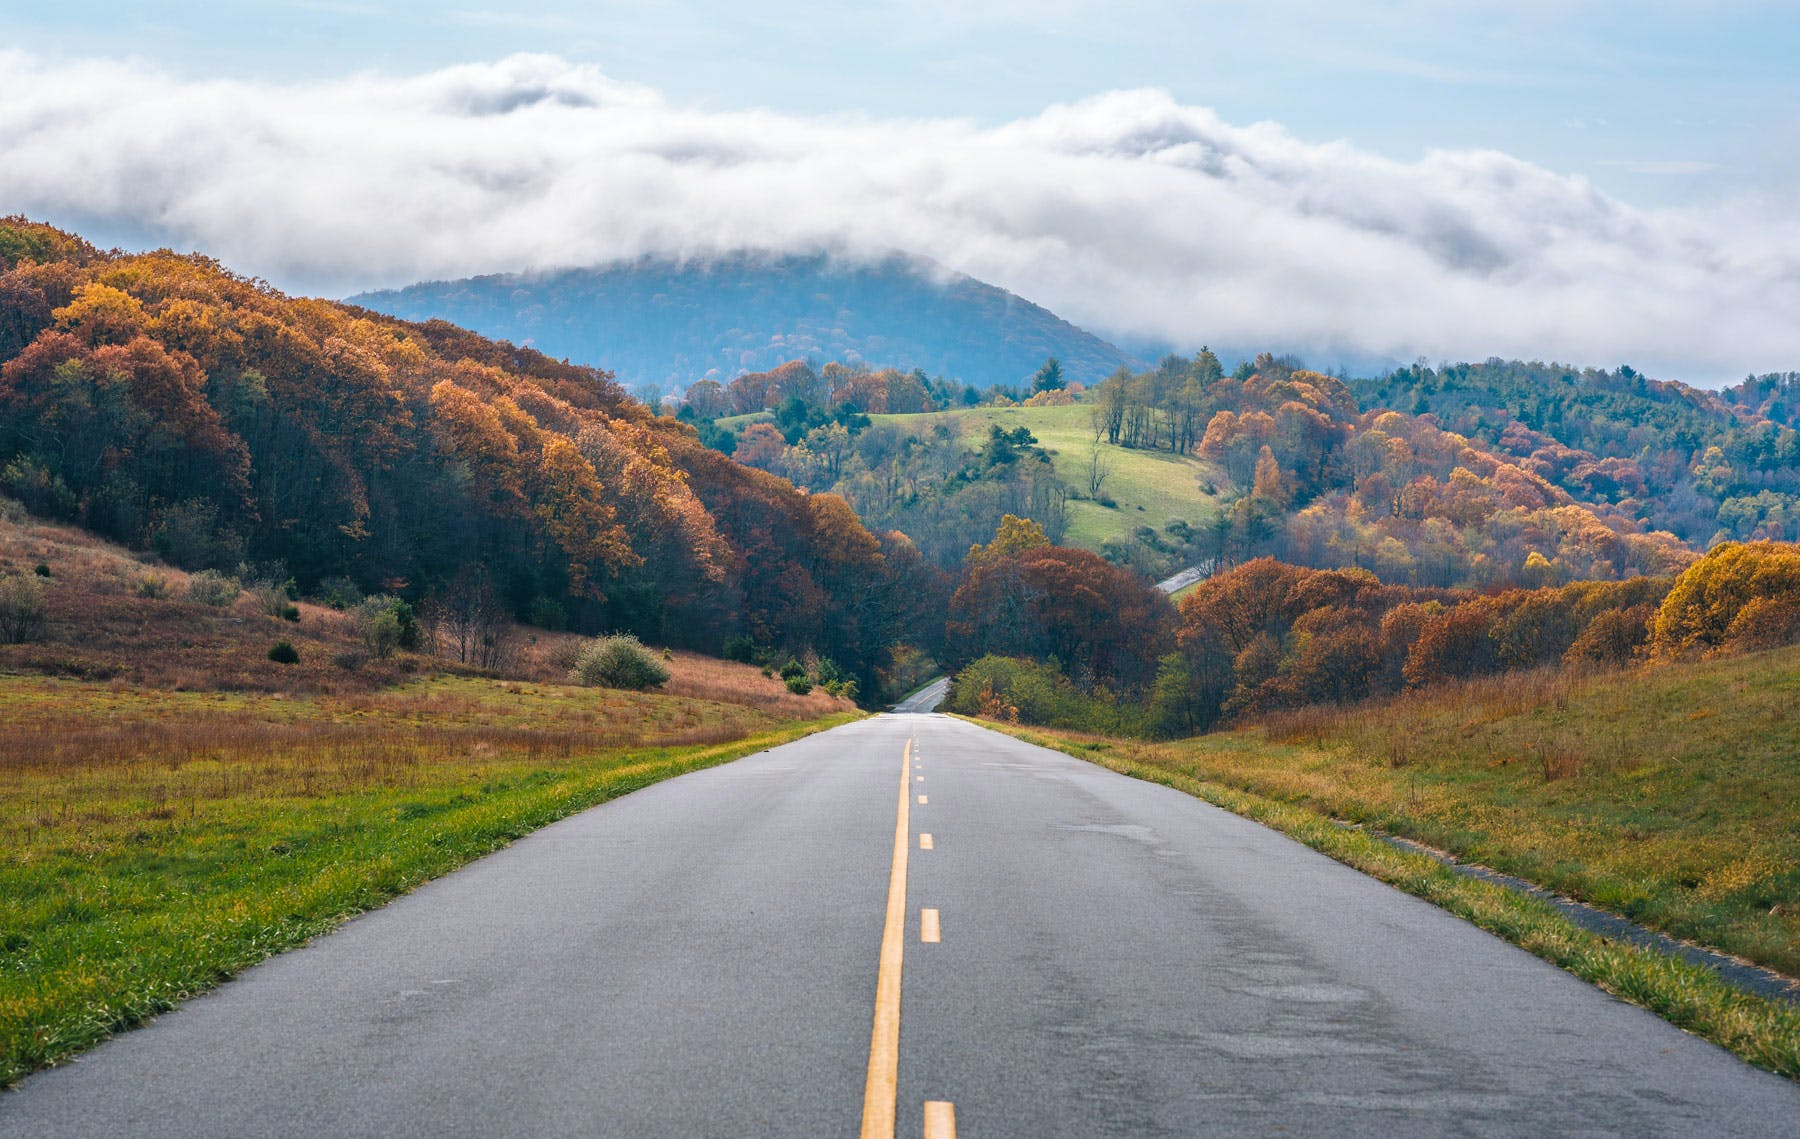 Auberge road trips